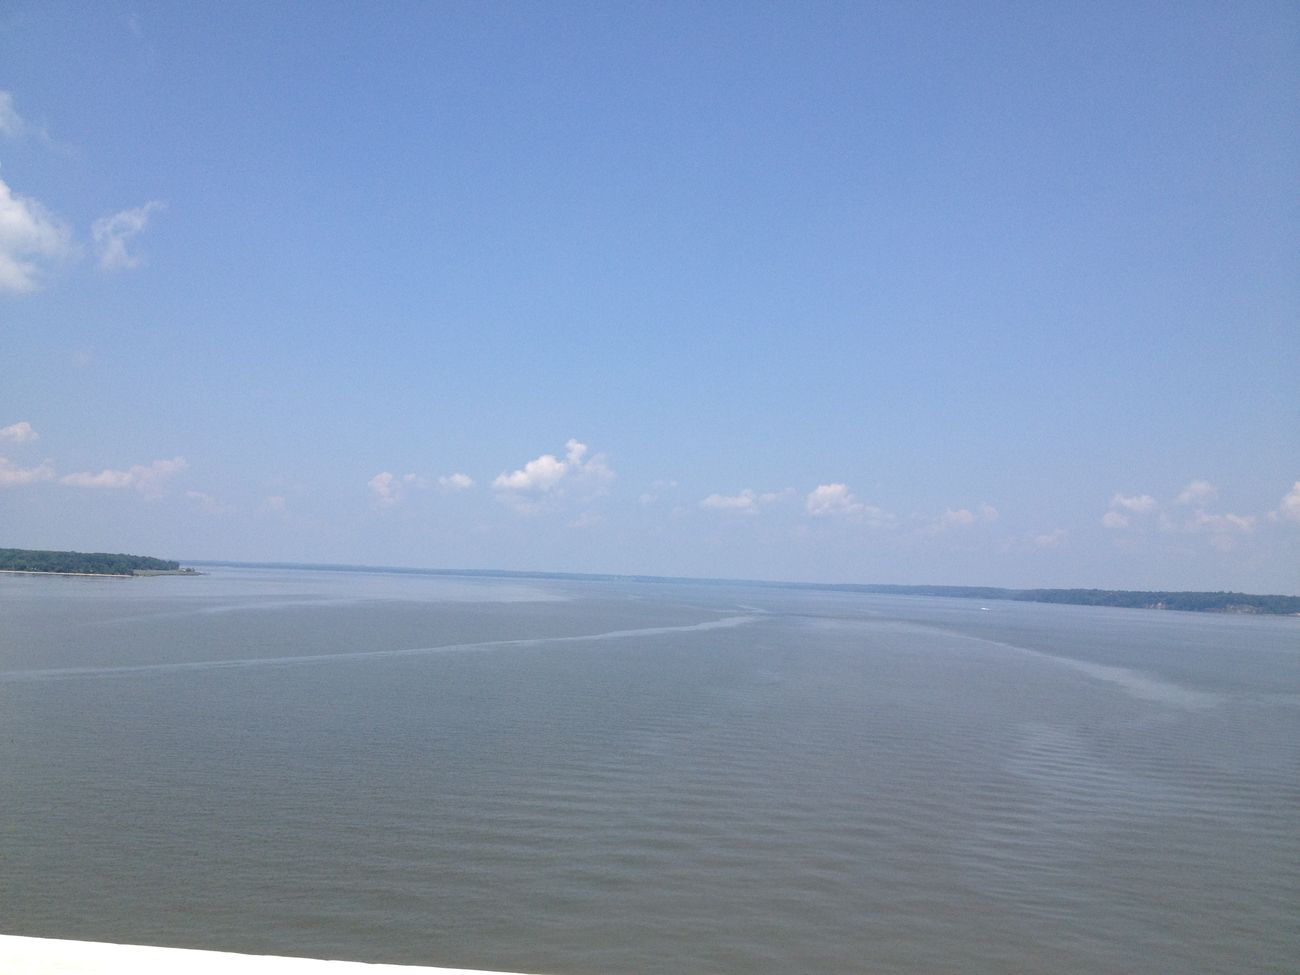 Taking Photos Enjoying Life Nature Photography beautiful Chesapeake Bay